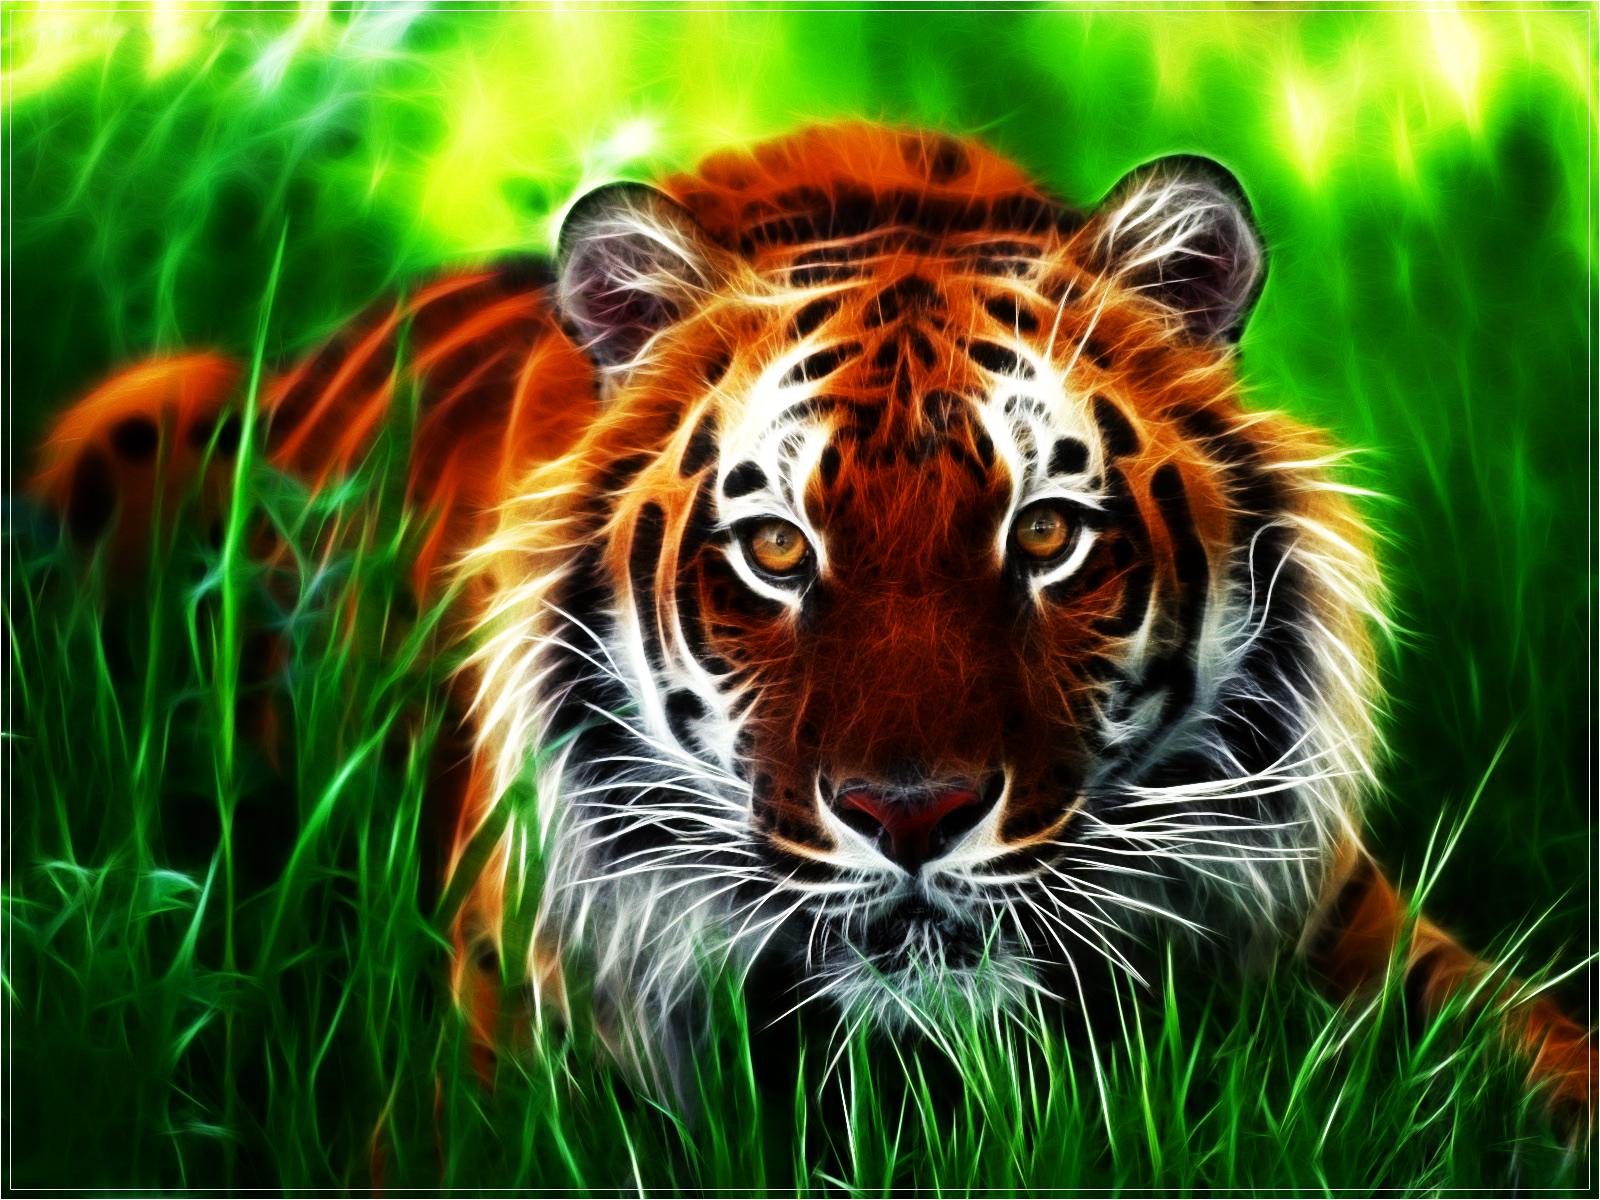 http://1.bp.blogspot.com/-VvJ9uBOyVq8/UGQBXLjR-EI/AAAAAAAAHBM/RsPJZkR5FNc/s1600/Tiger-wallpaper-17.jpg